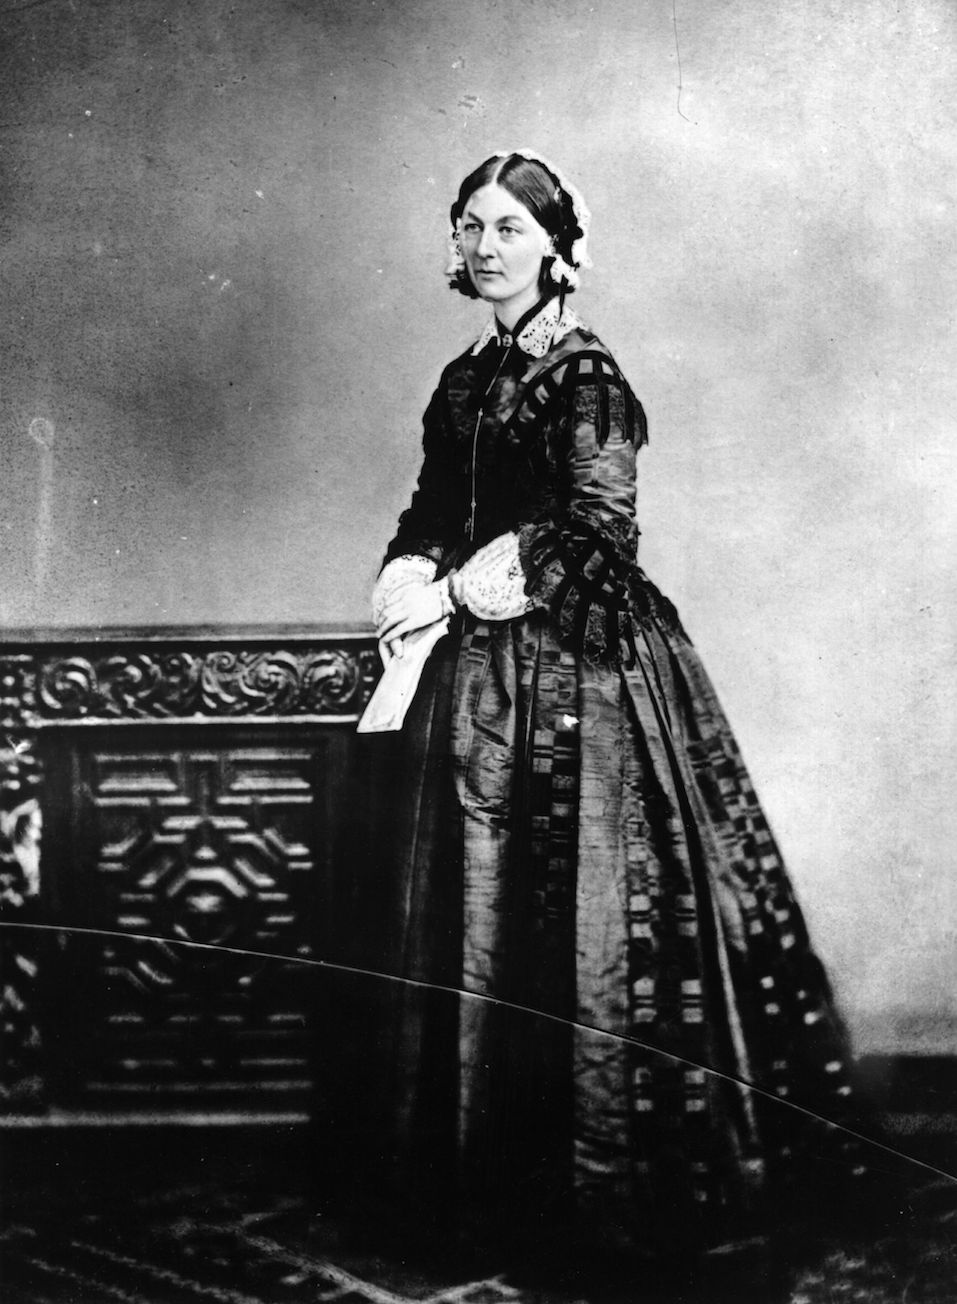 English nurse, hospital reformer and philanthropist Florence Nightingale